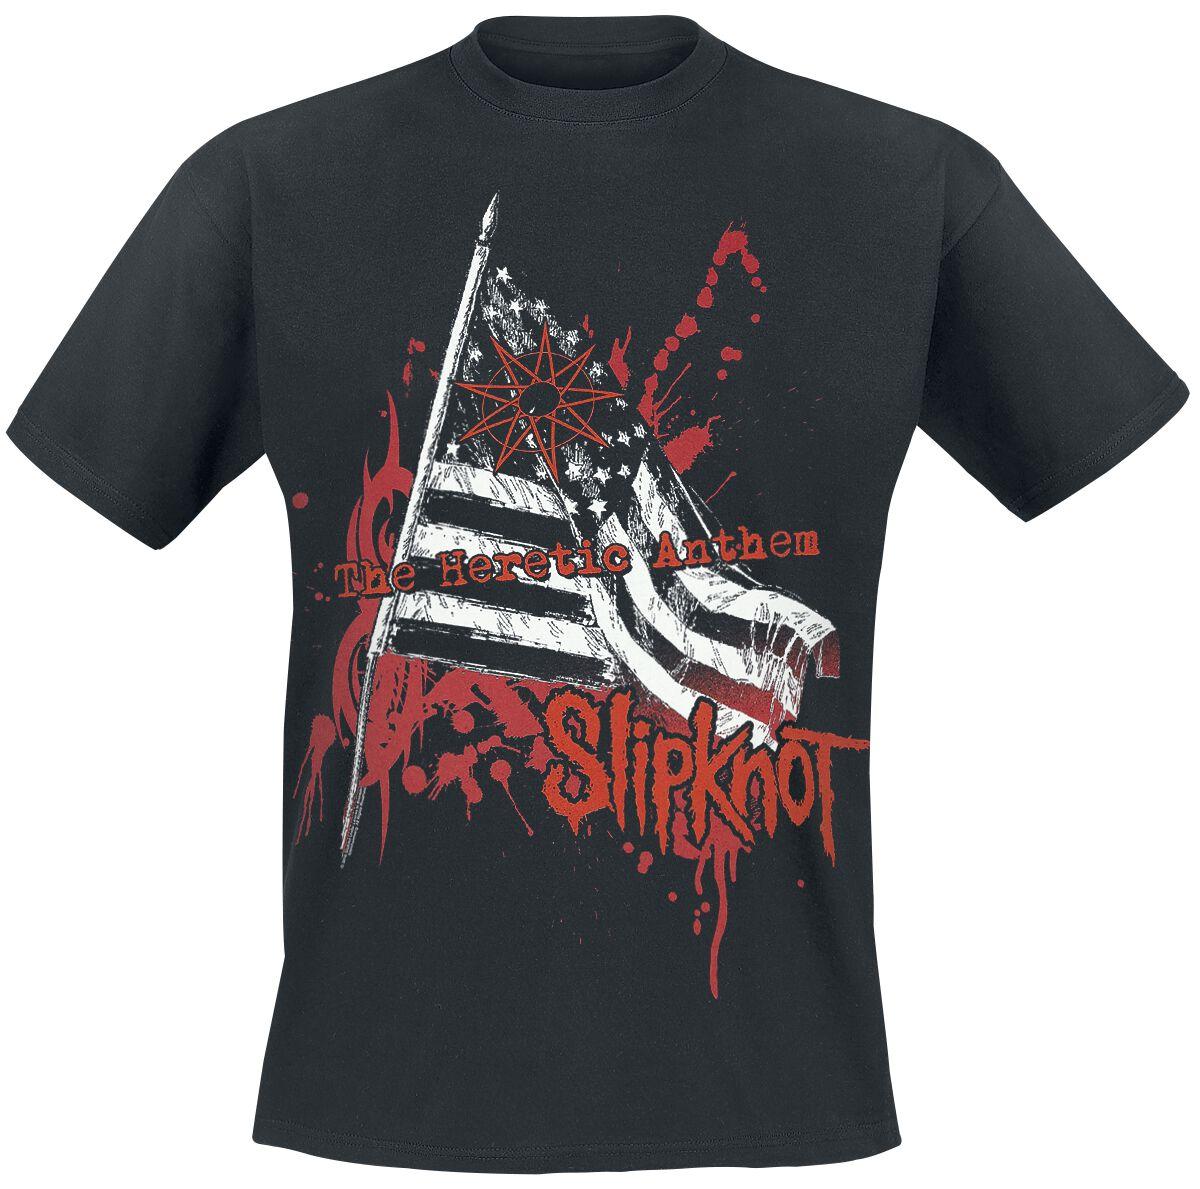 Image of   Slipknot Heretic anthem T-Shirt sort